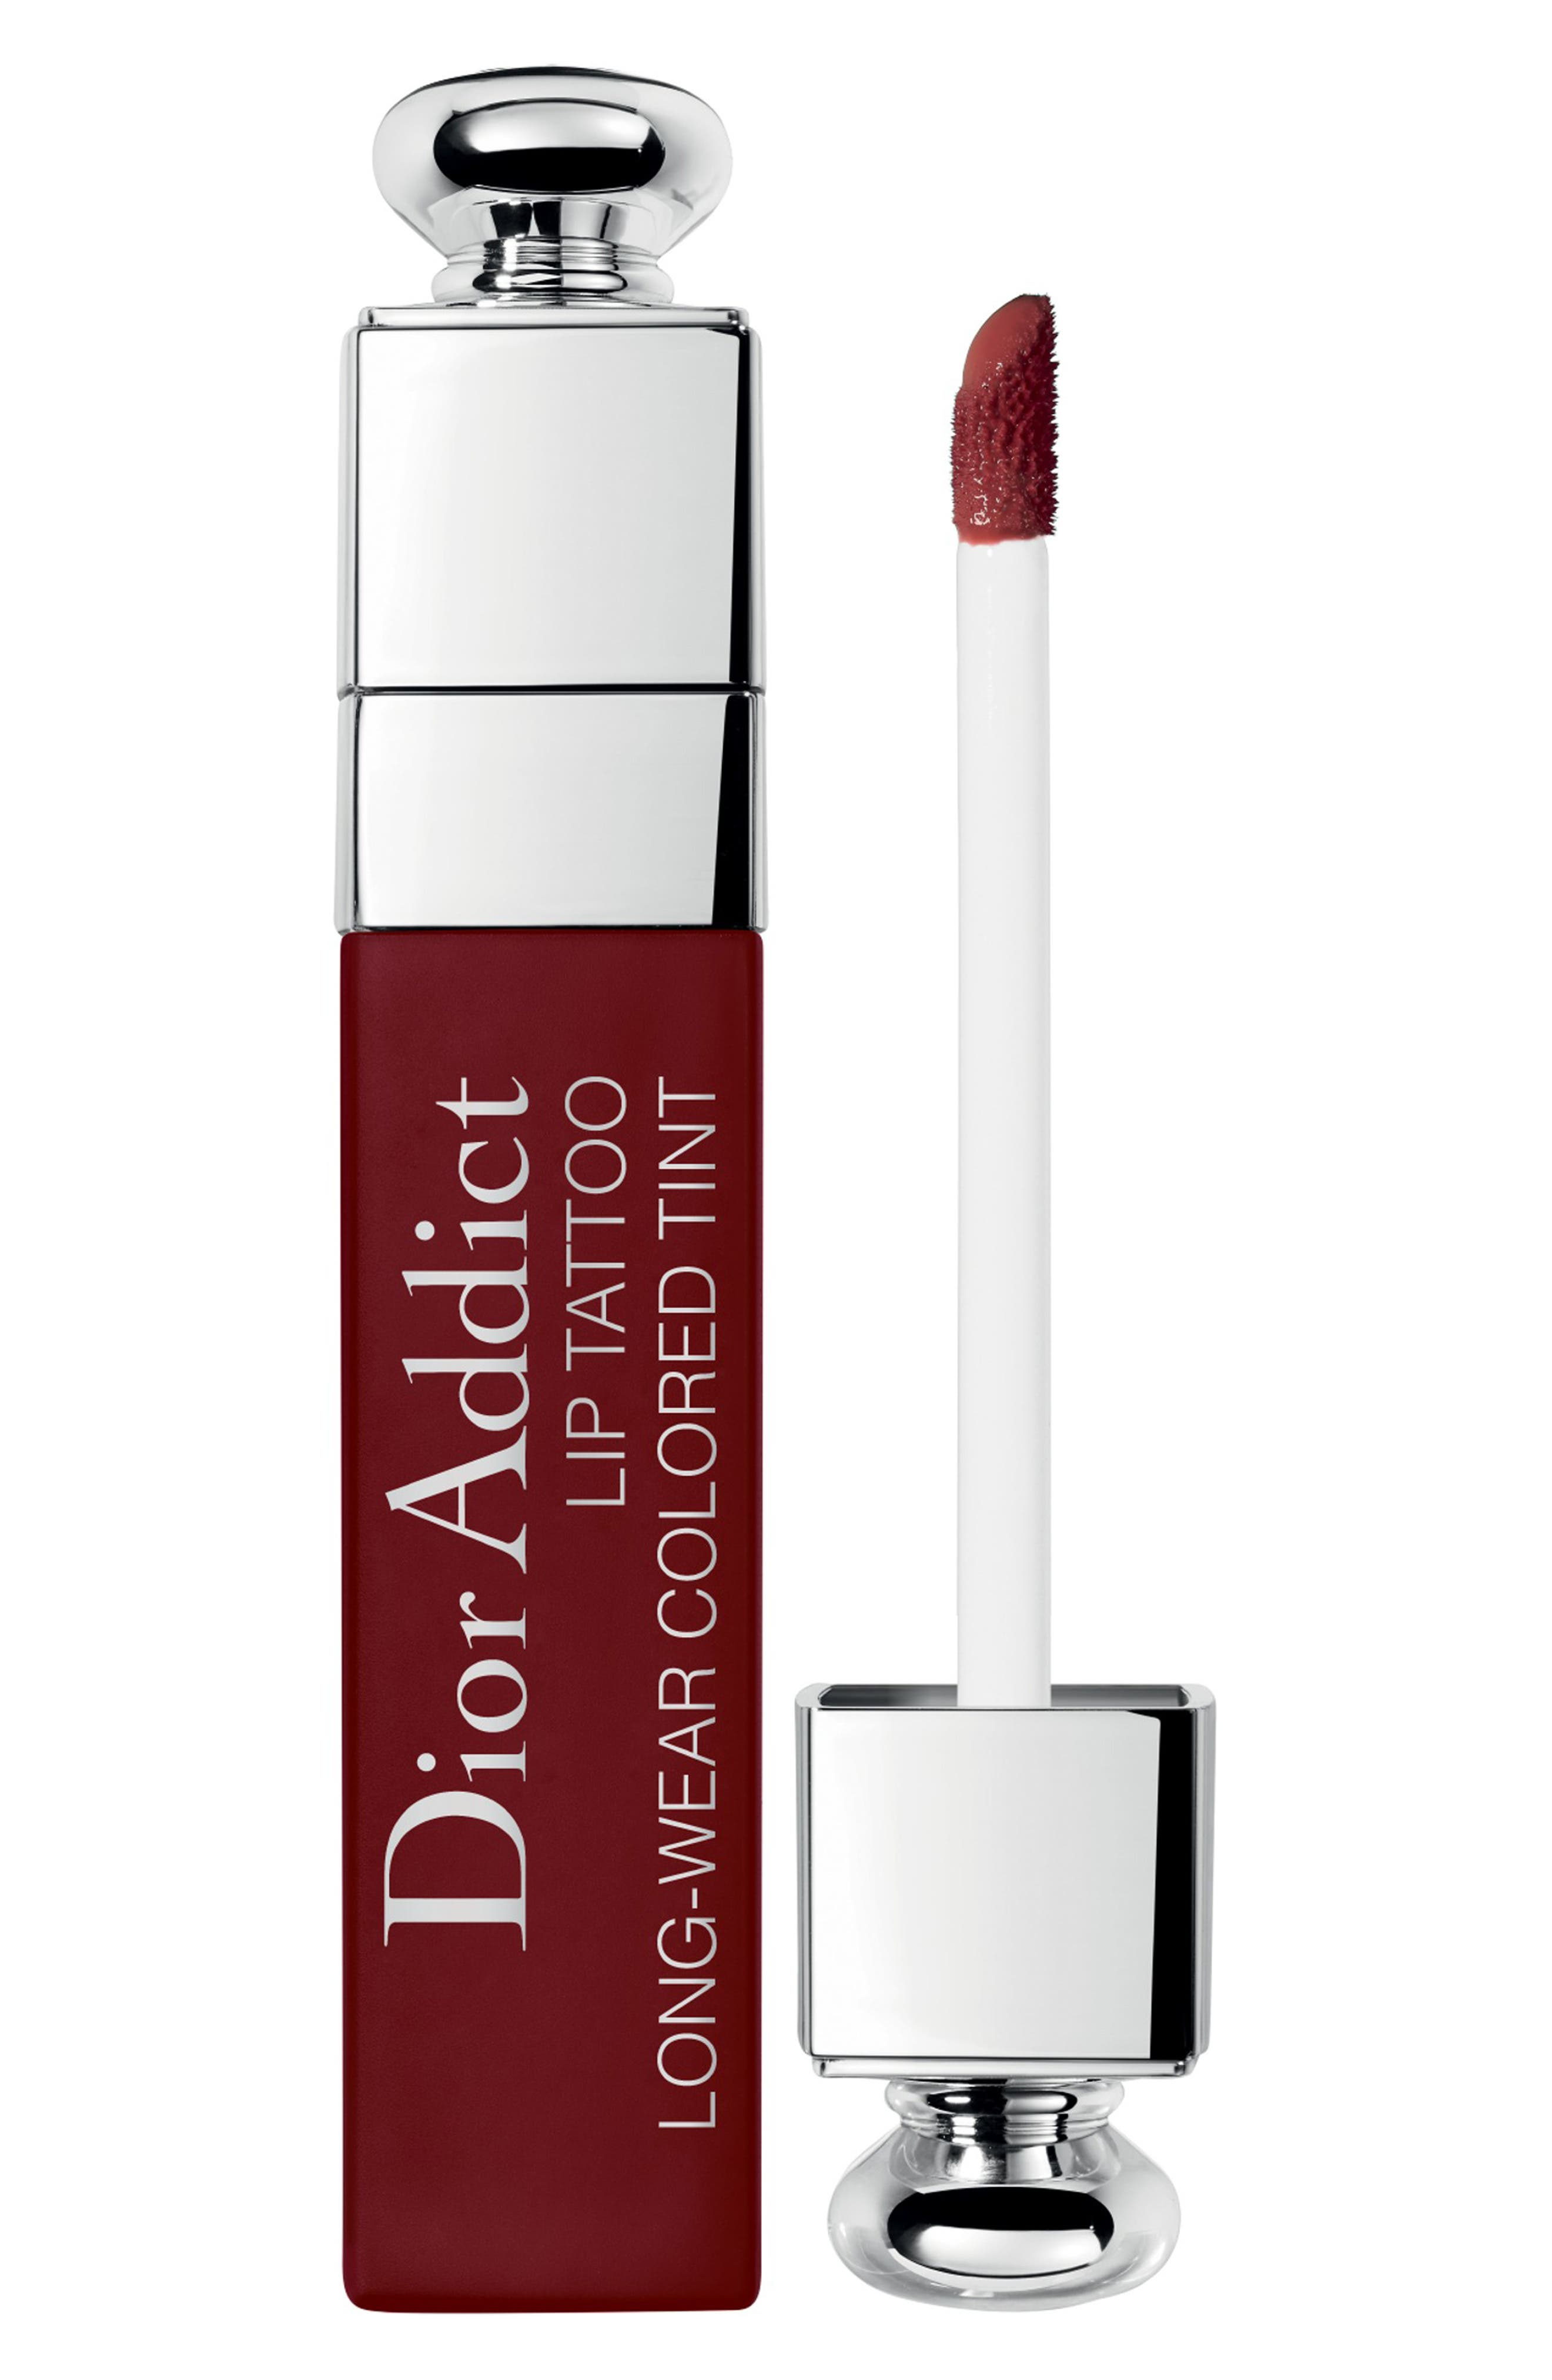 Dior Addict Lip Tattoo Long-Wearing Color Tint - 831 Natural Brown